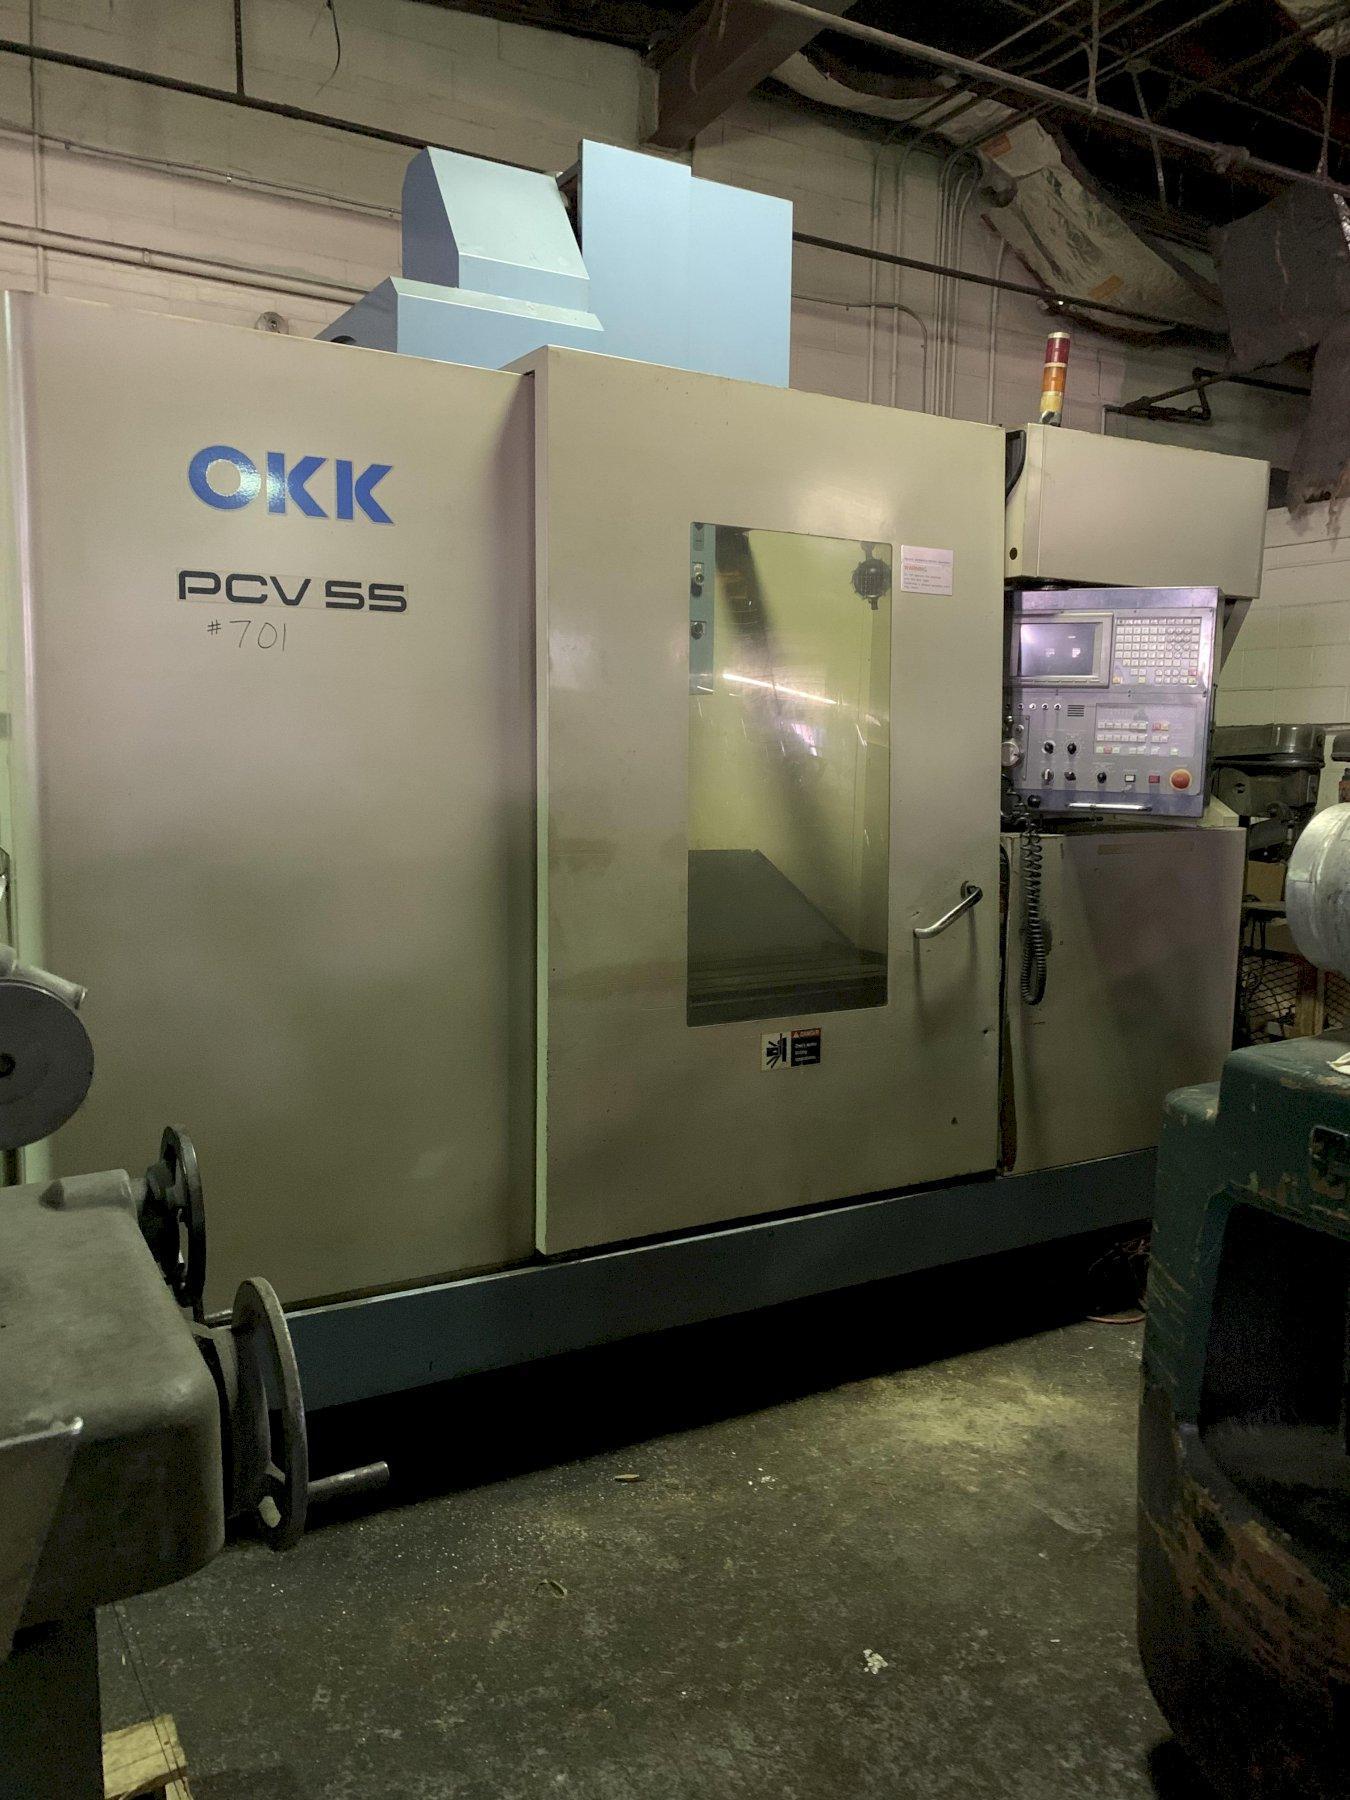 "OKK PCV-55 CNC VERTICAL MACHINING CENTER 48"" x 22"" TABLE, CAT 50, 20 TOOLS"